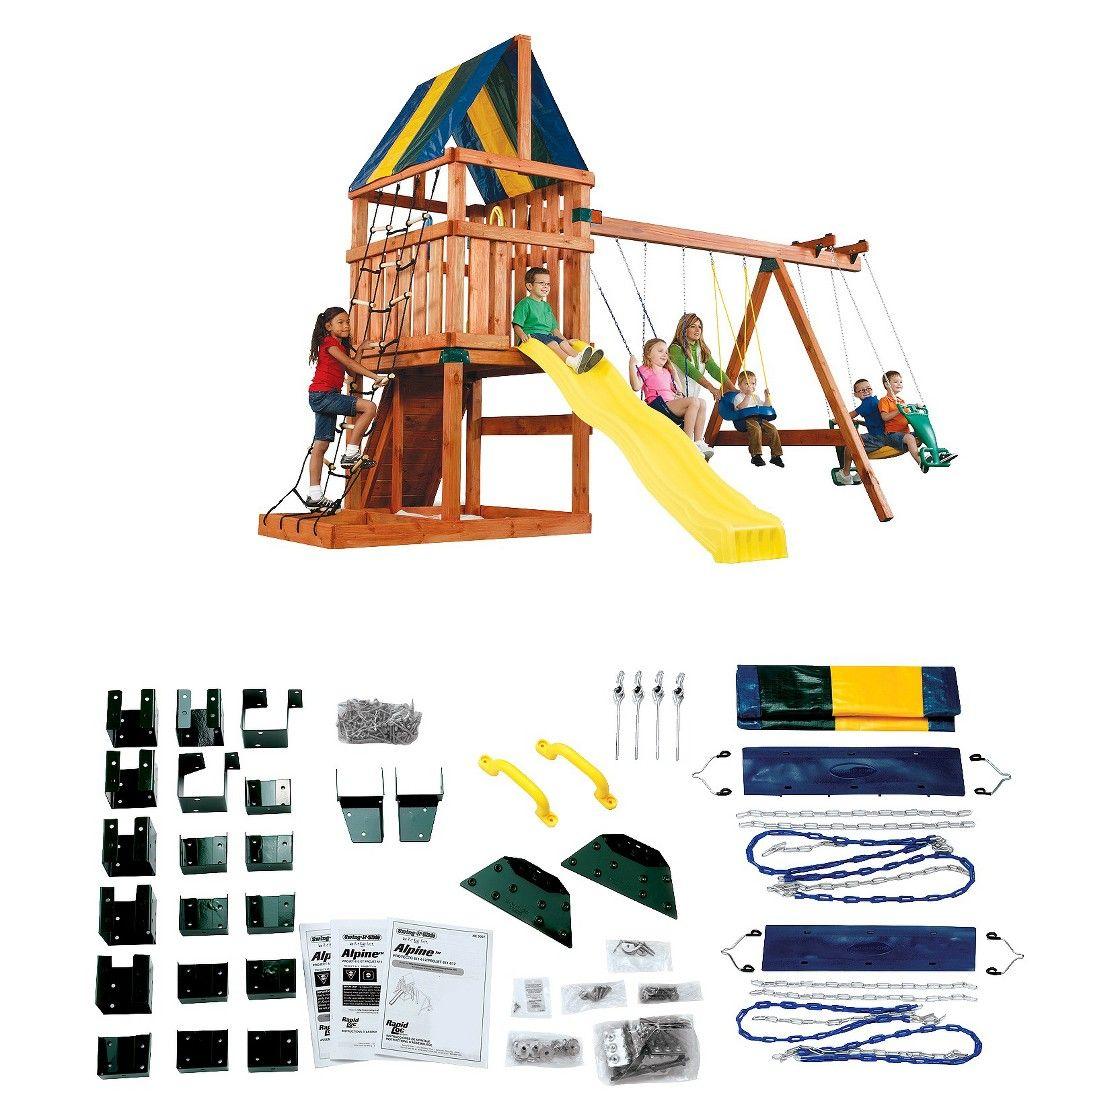 Alpine custom wooden play set kit swing set hardware